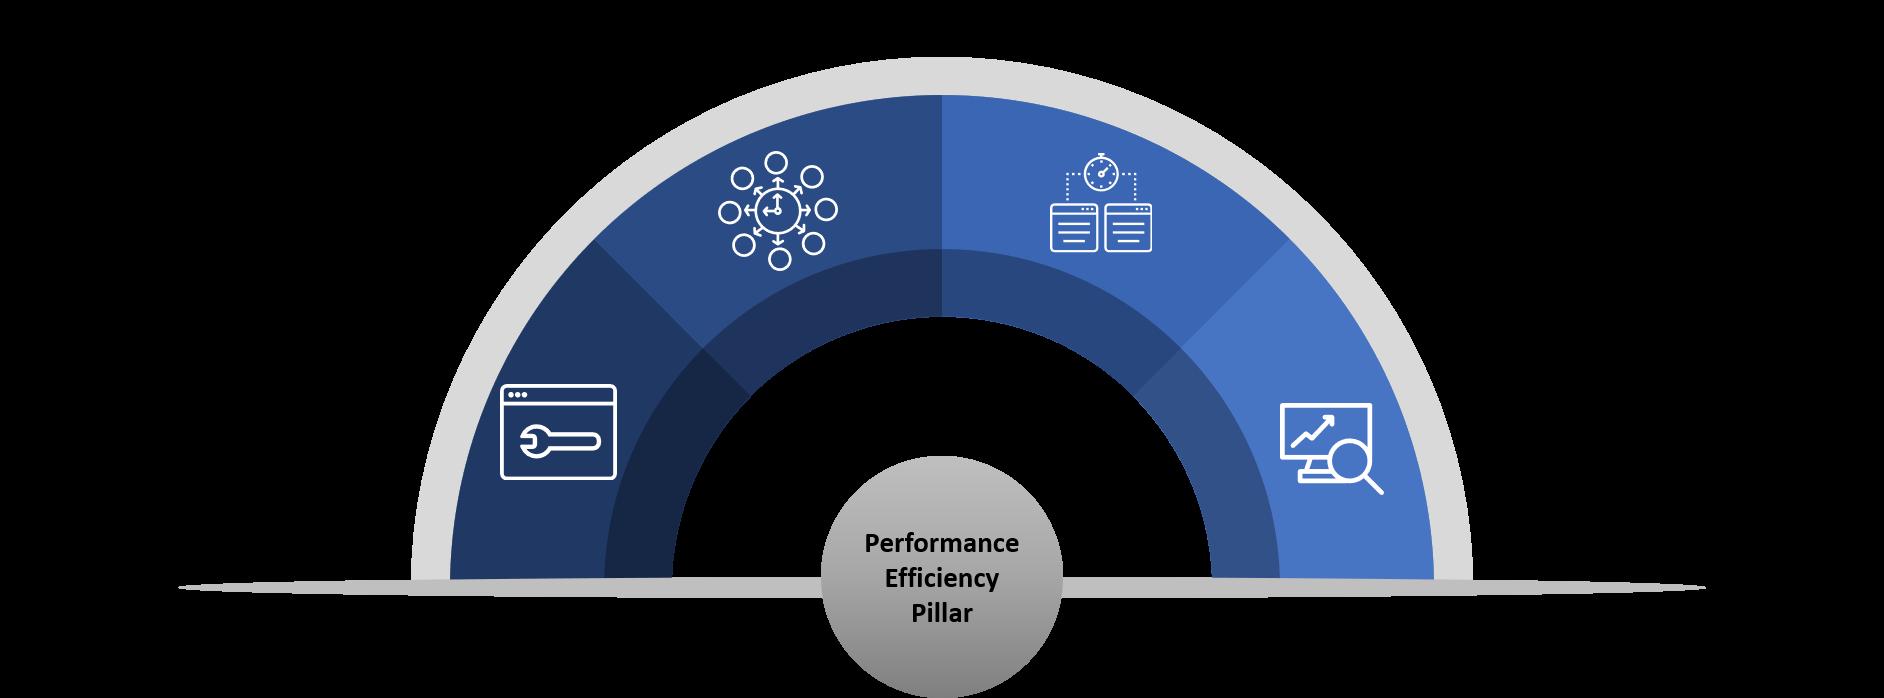 Performance Efficiency Pillar